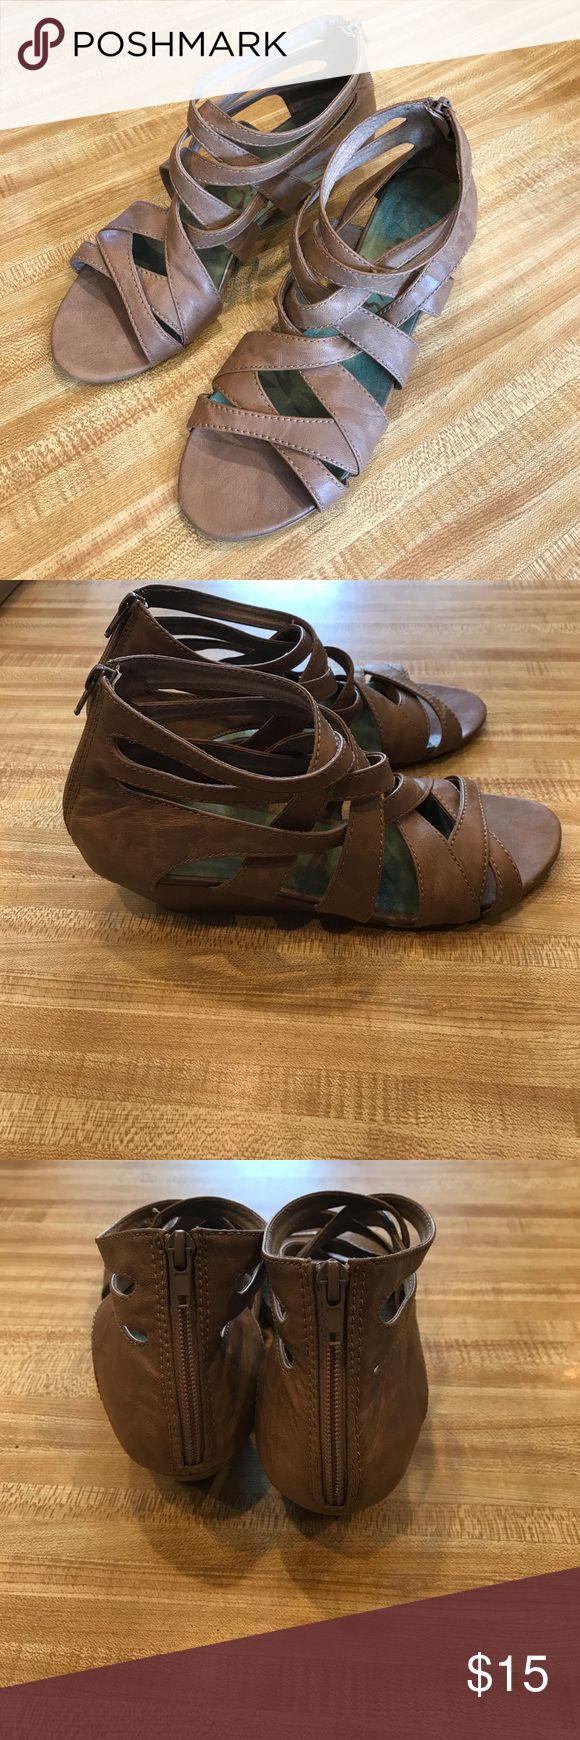 Blowfish Sandals Strappy sandals by Blowfish. Super cute detail. Blowfish  Shoes